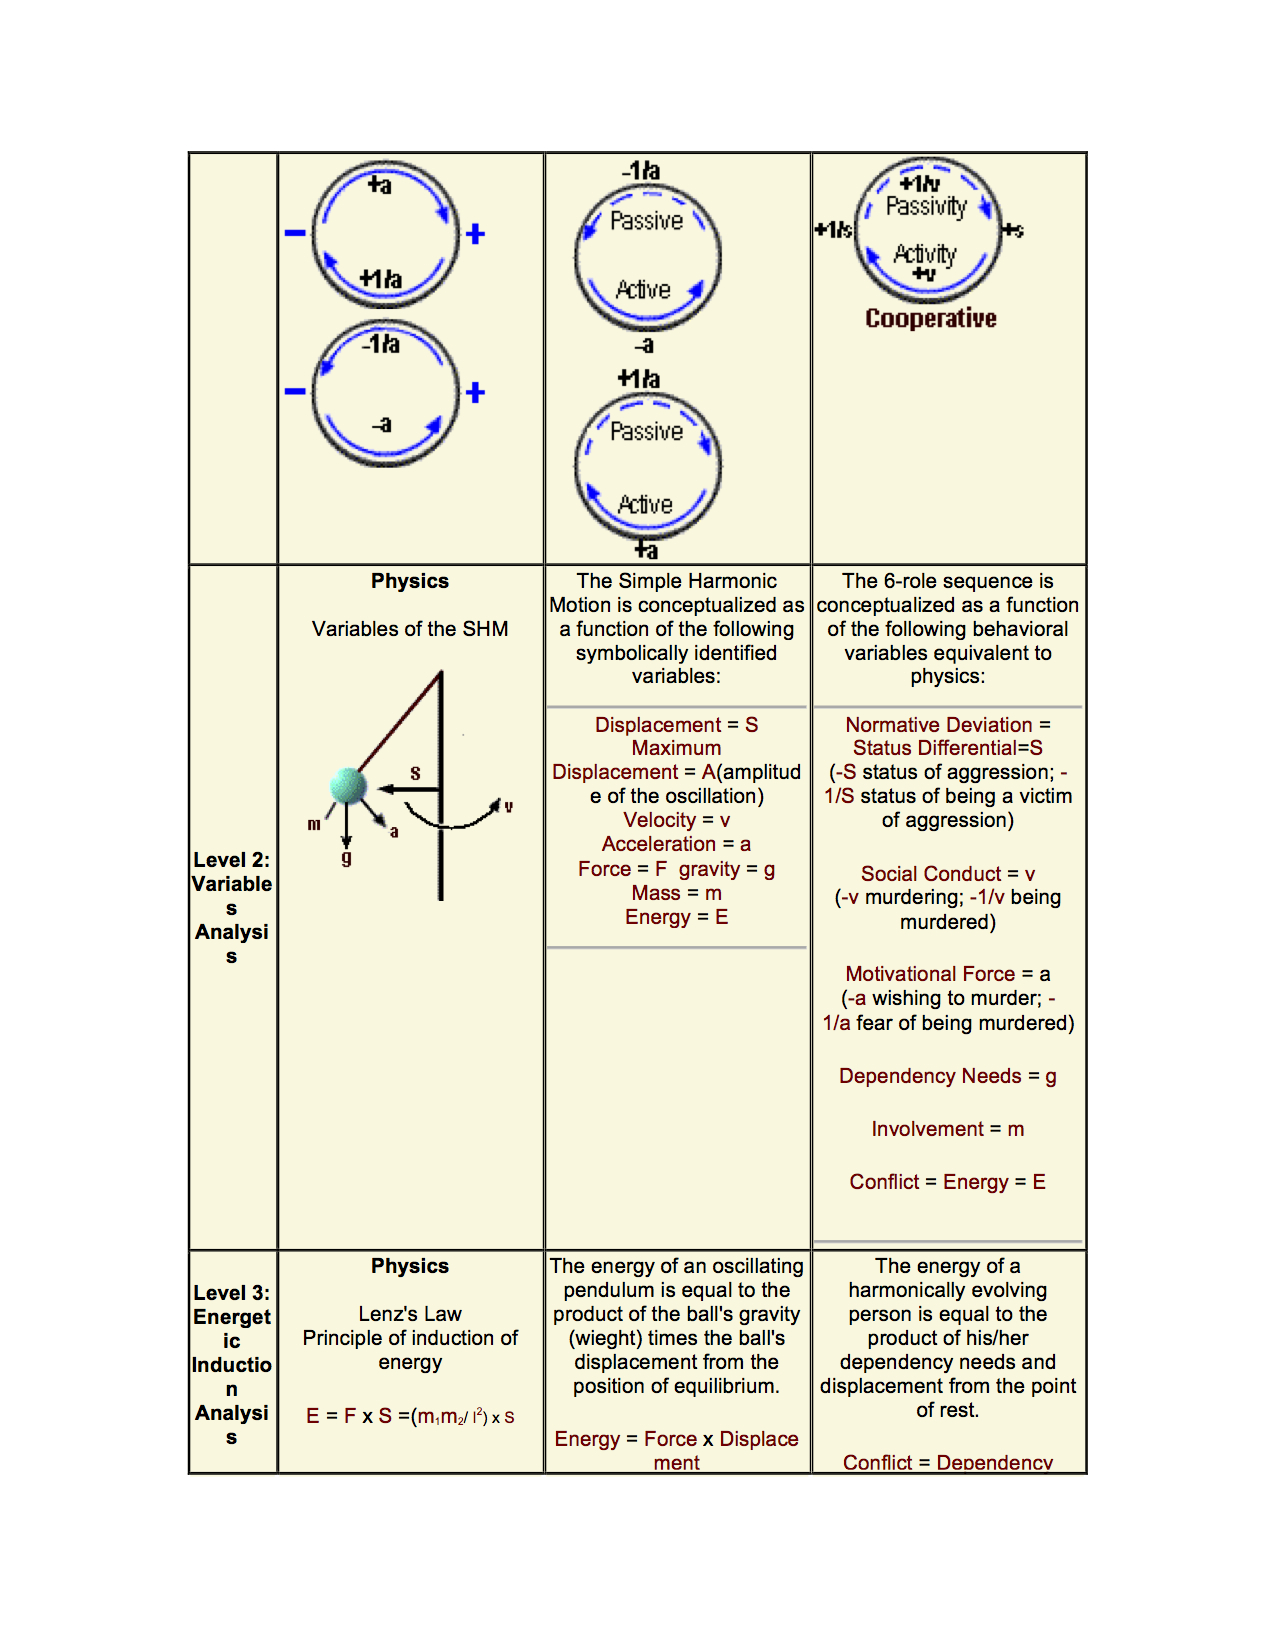 The Formal Analysis Profile2.jpg